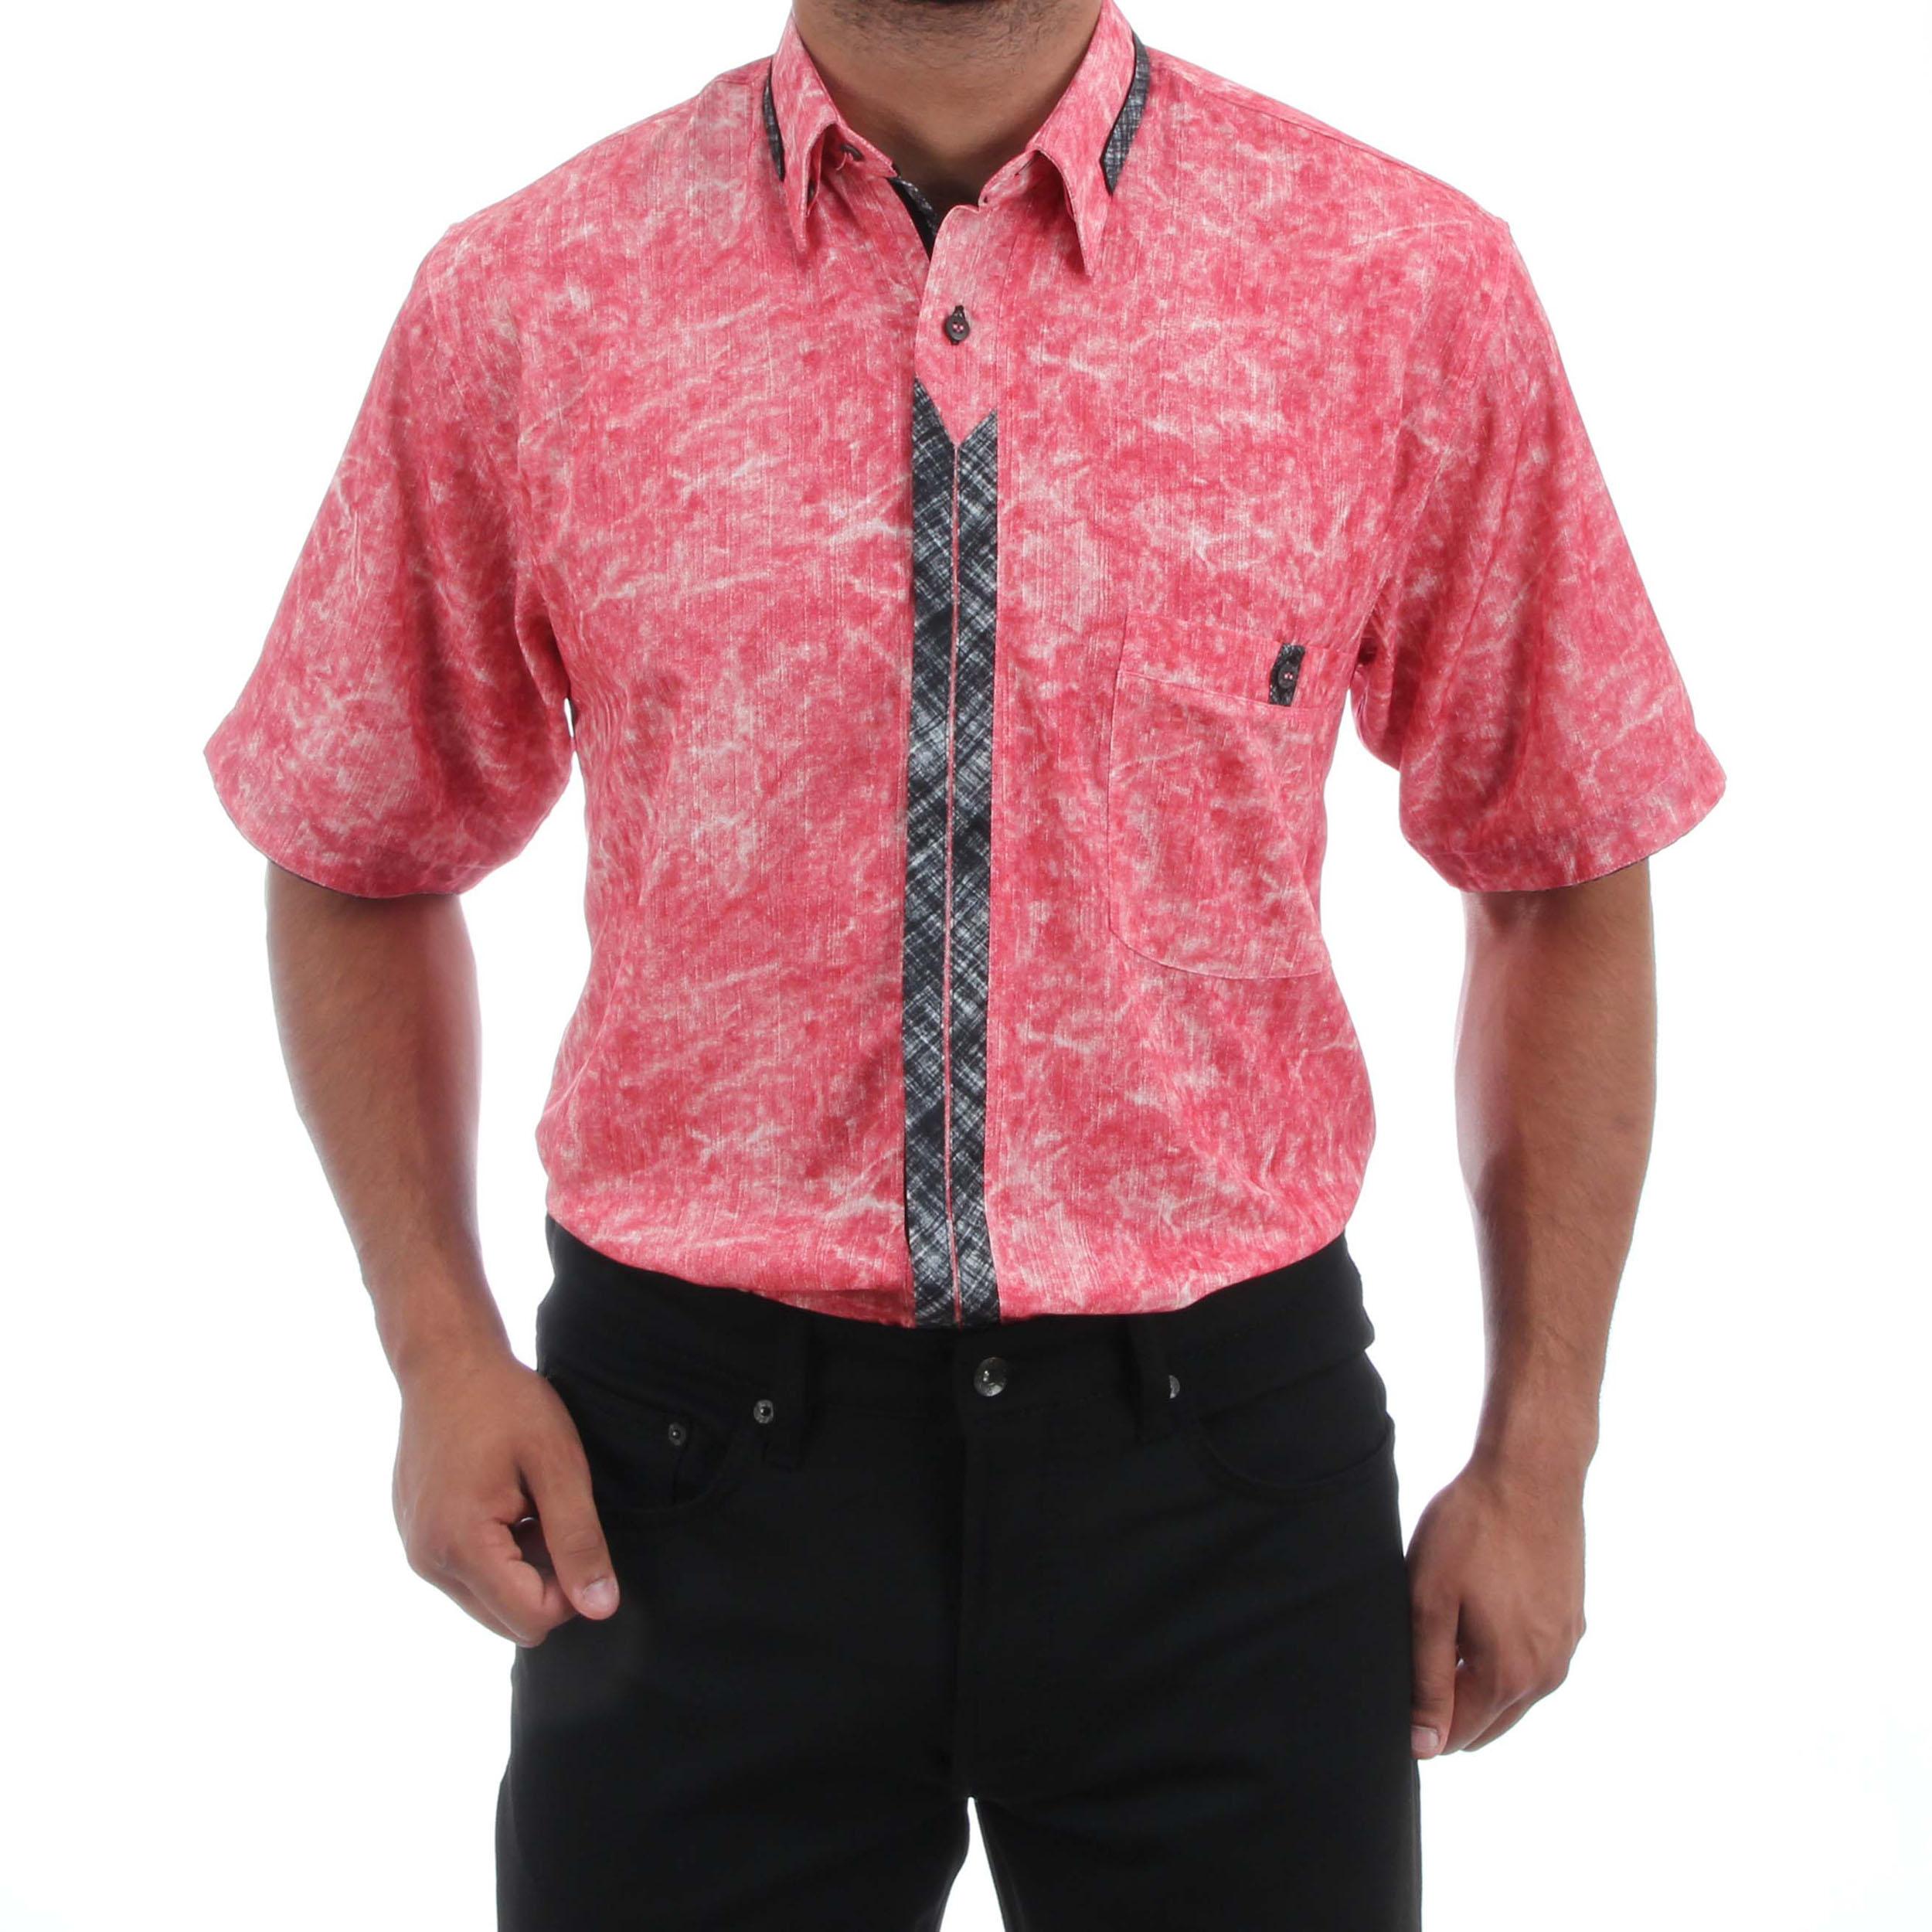 H.K. Mandel Kreative Mode für Männer - Modisches Casual Hemd in Rosé ... 0e847cd922